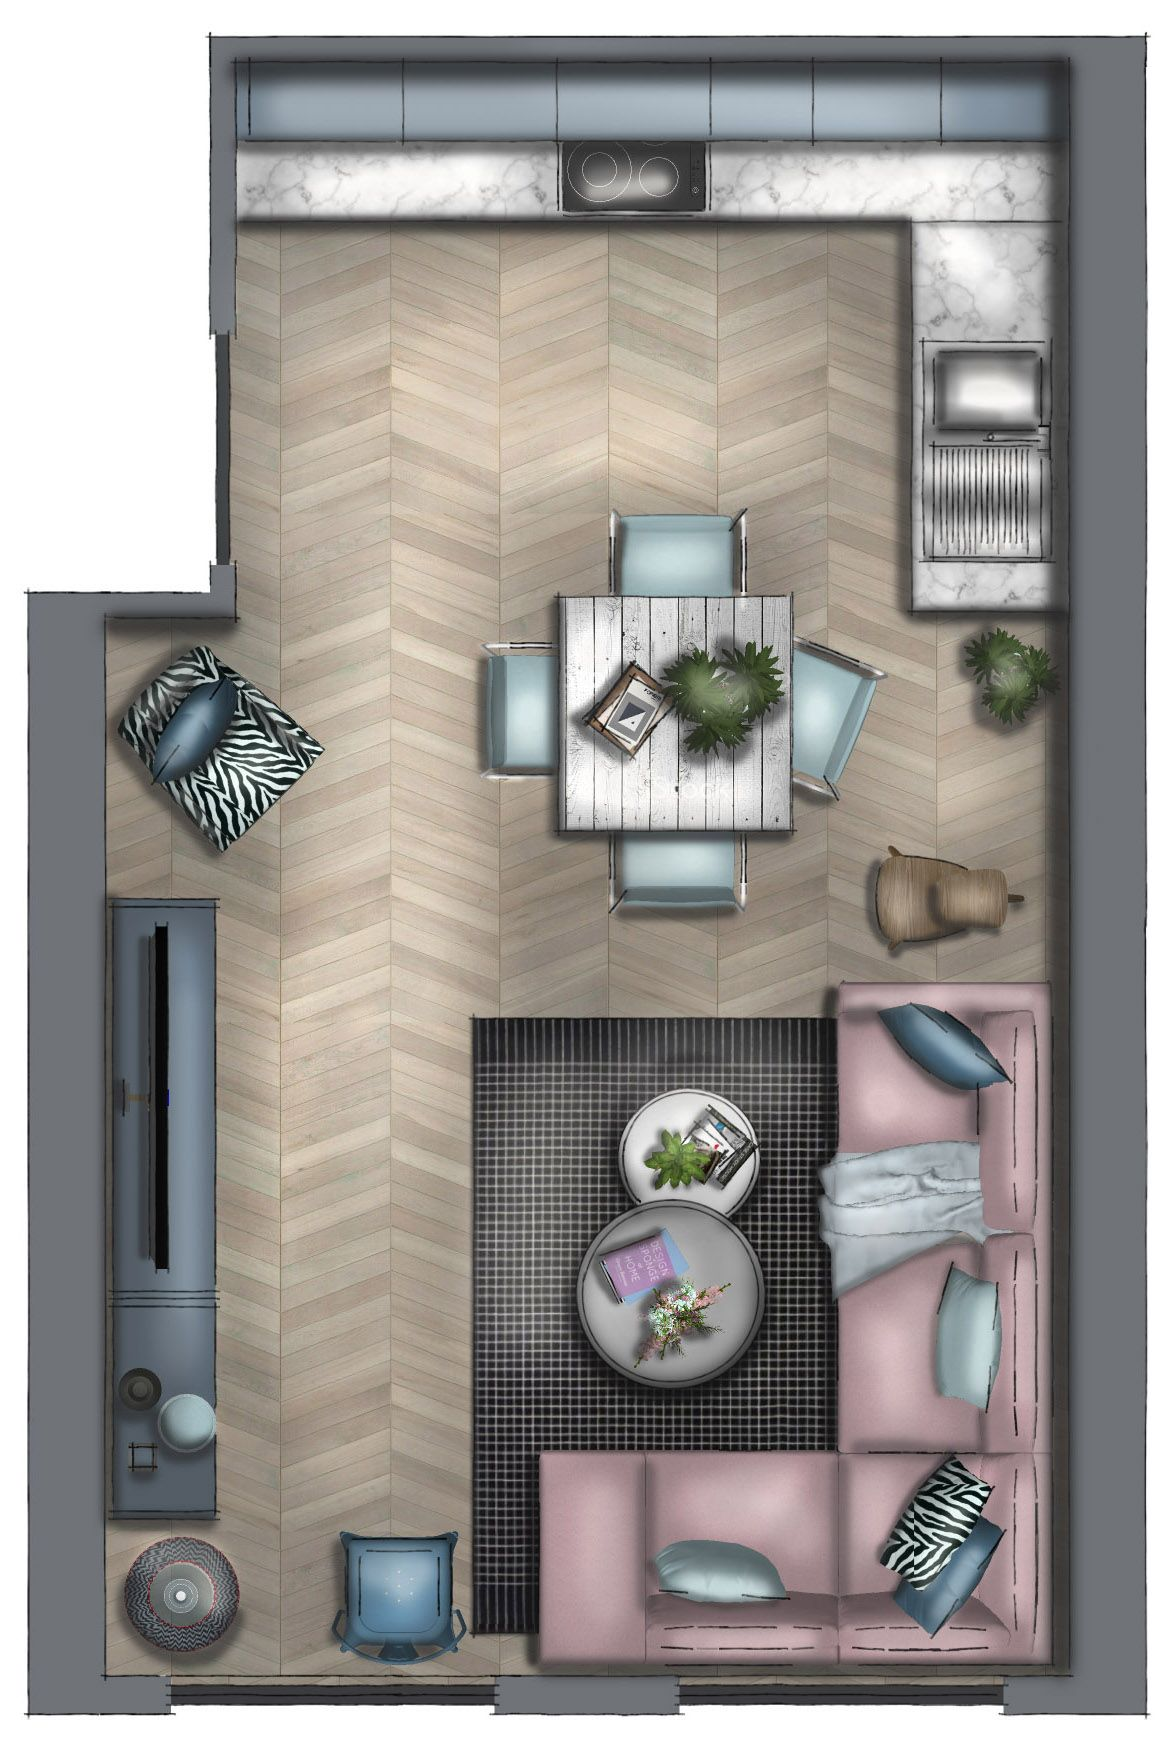 Rendered Floor Plan Interior Design Renderings Rendered Floor